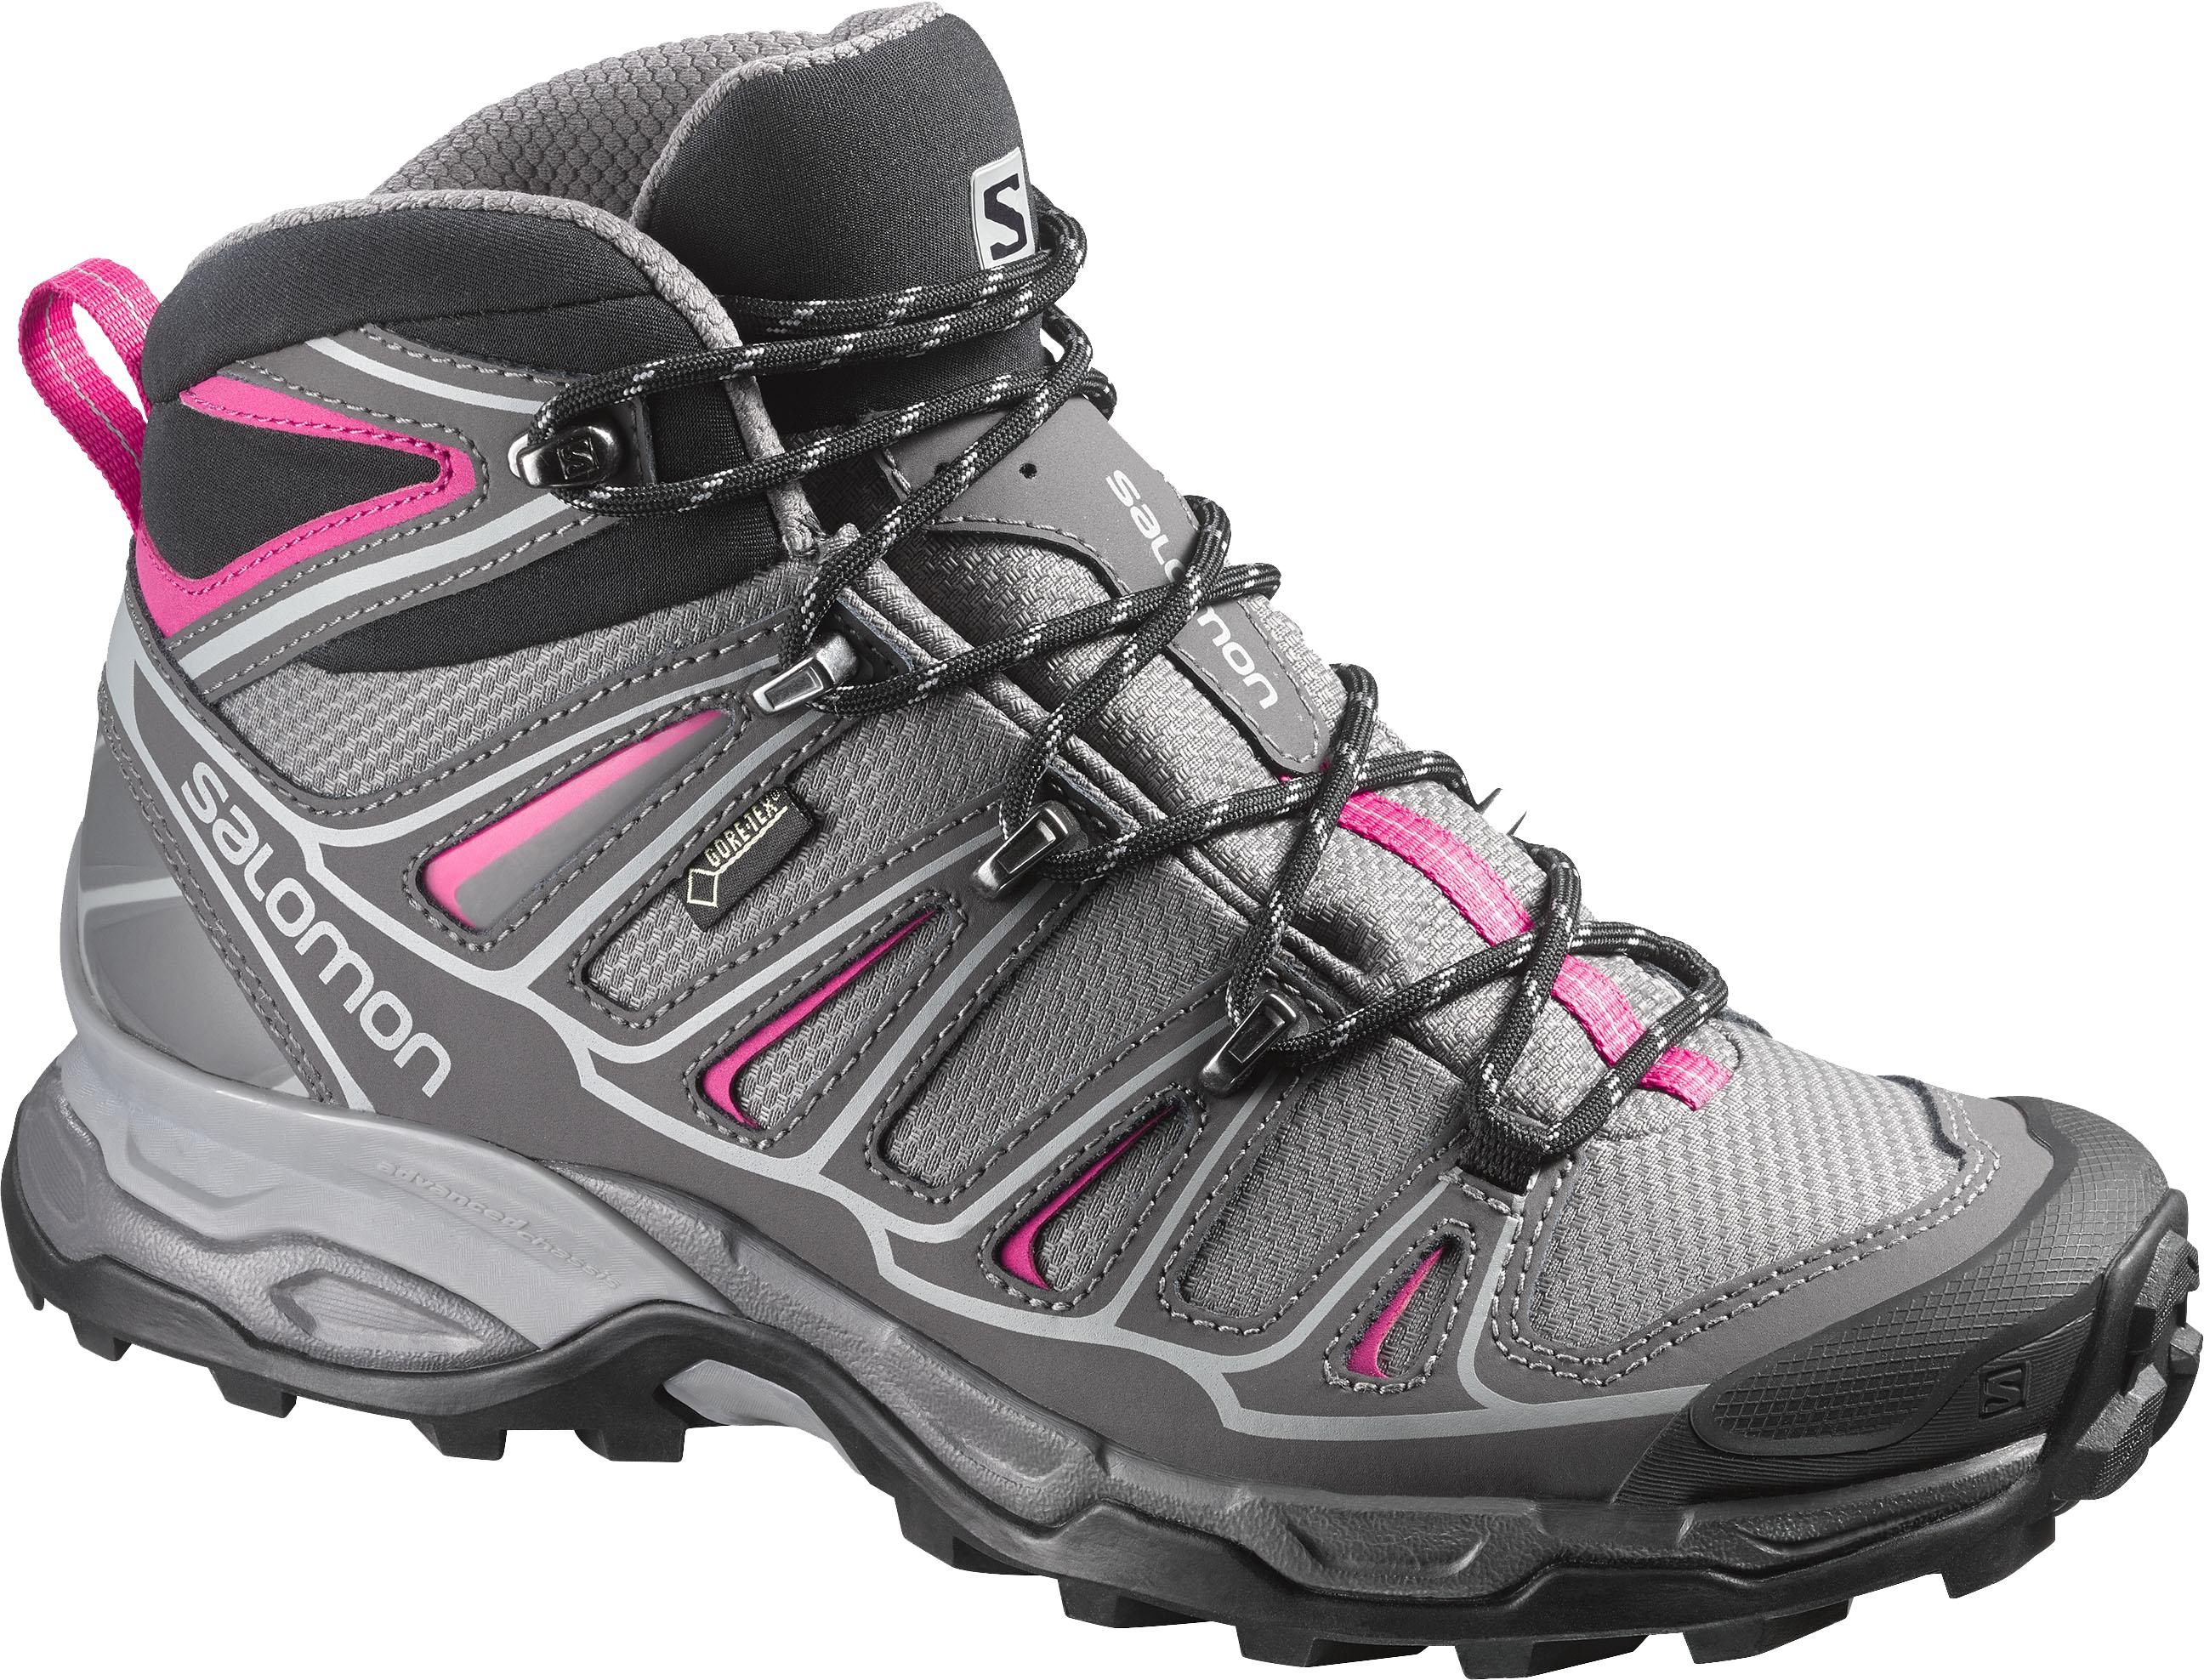 Salomon X Ultra Mid 2 GTX Light Trail Shoes - Women s 93da7f1a48